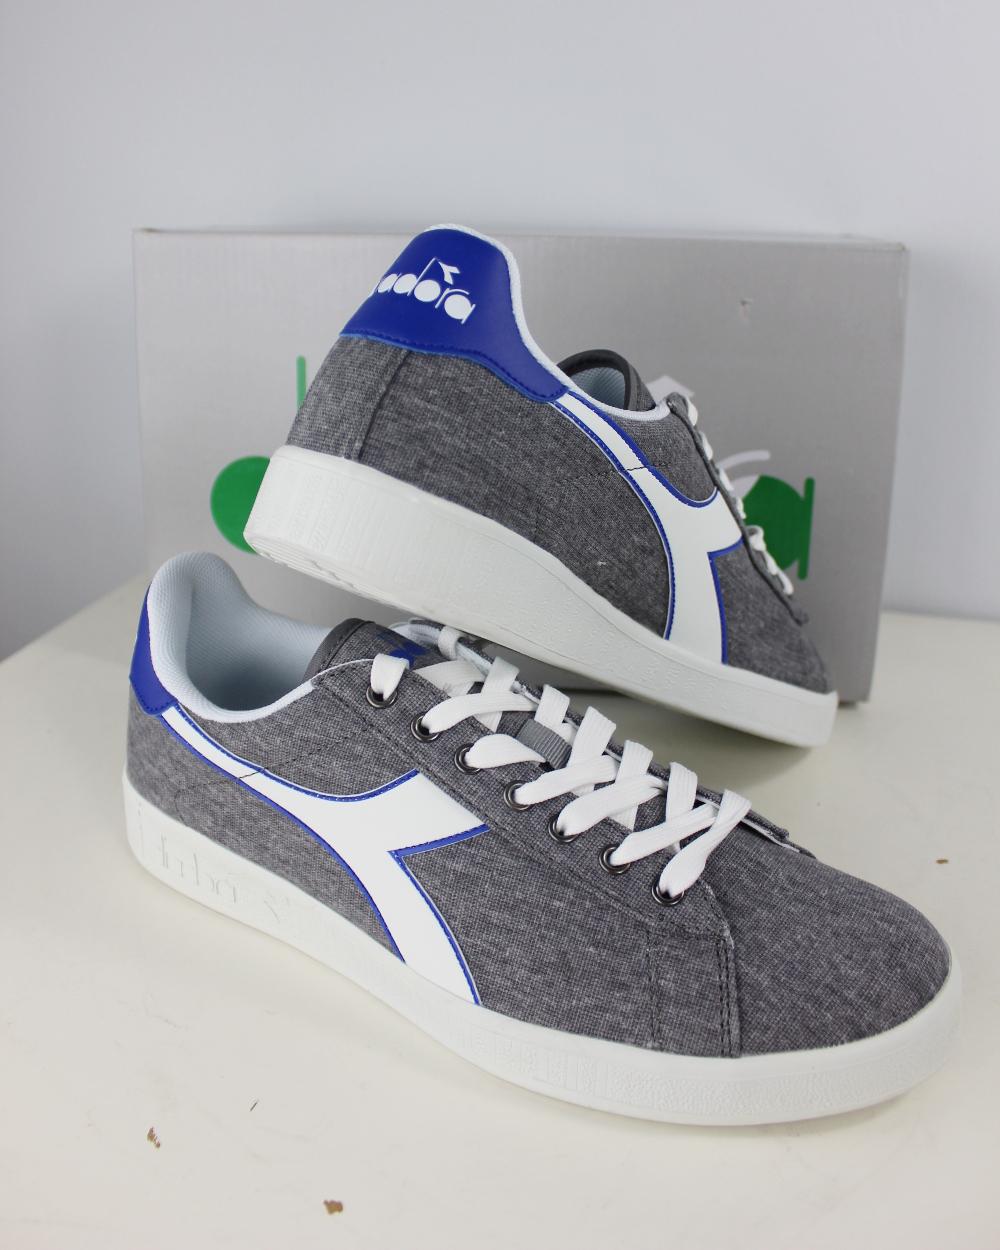 Diadora Scarpe Sneakers Ginnastica LifeStyle Sportswear Game Canvas ... 87511286b0f